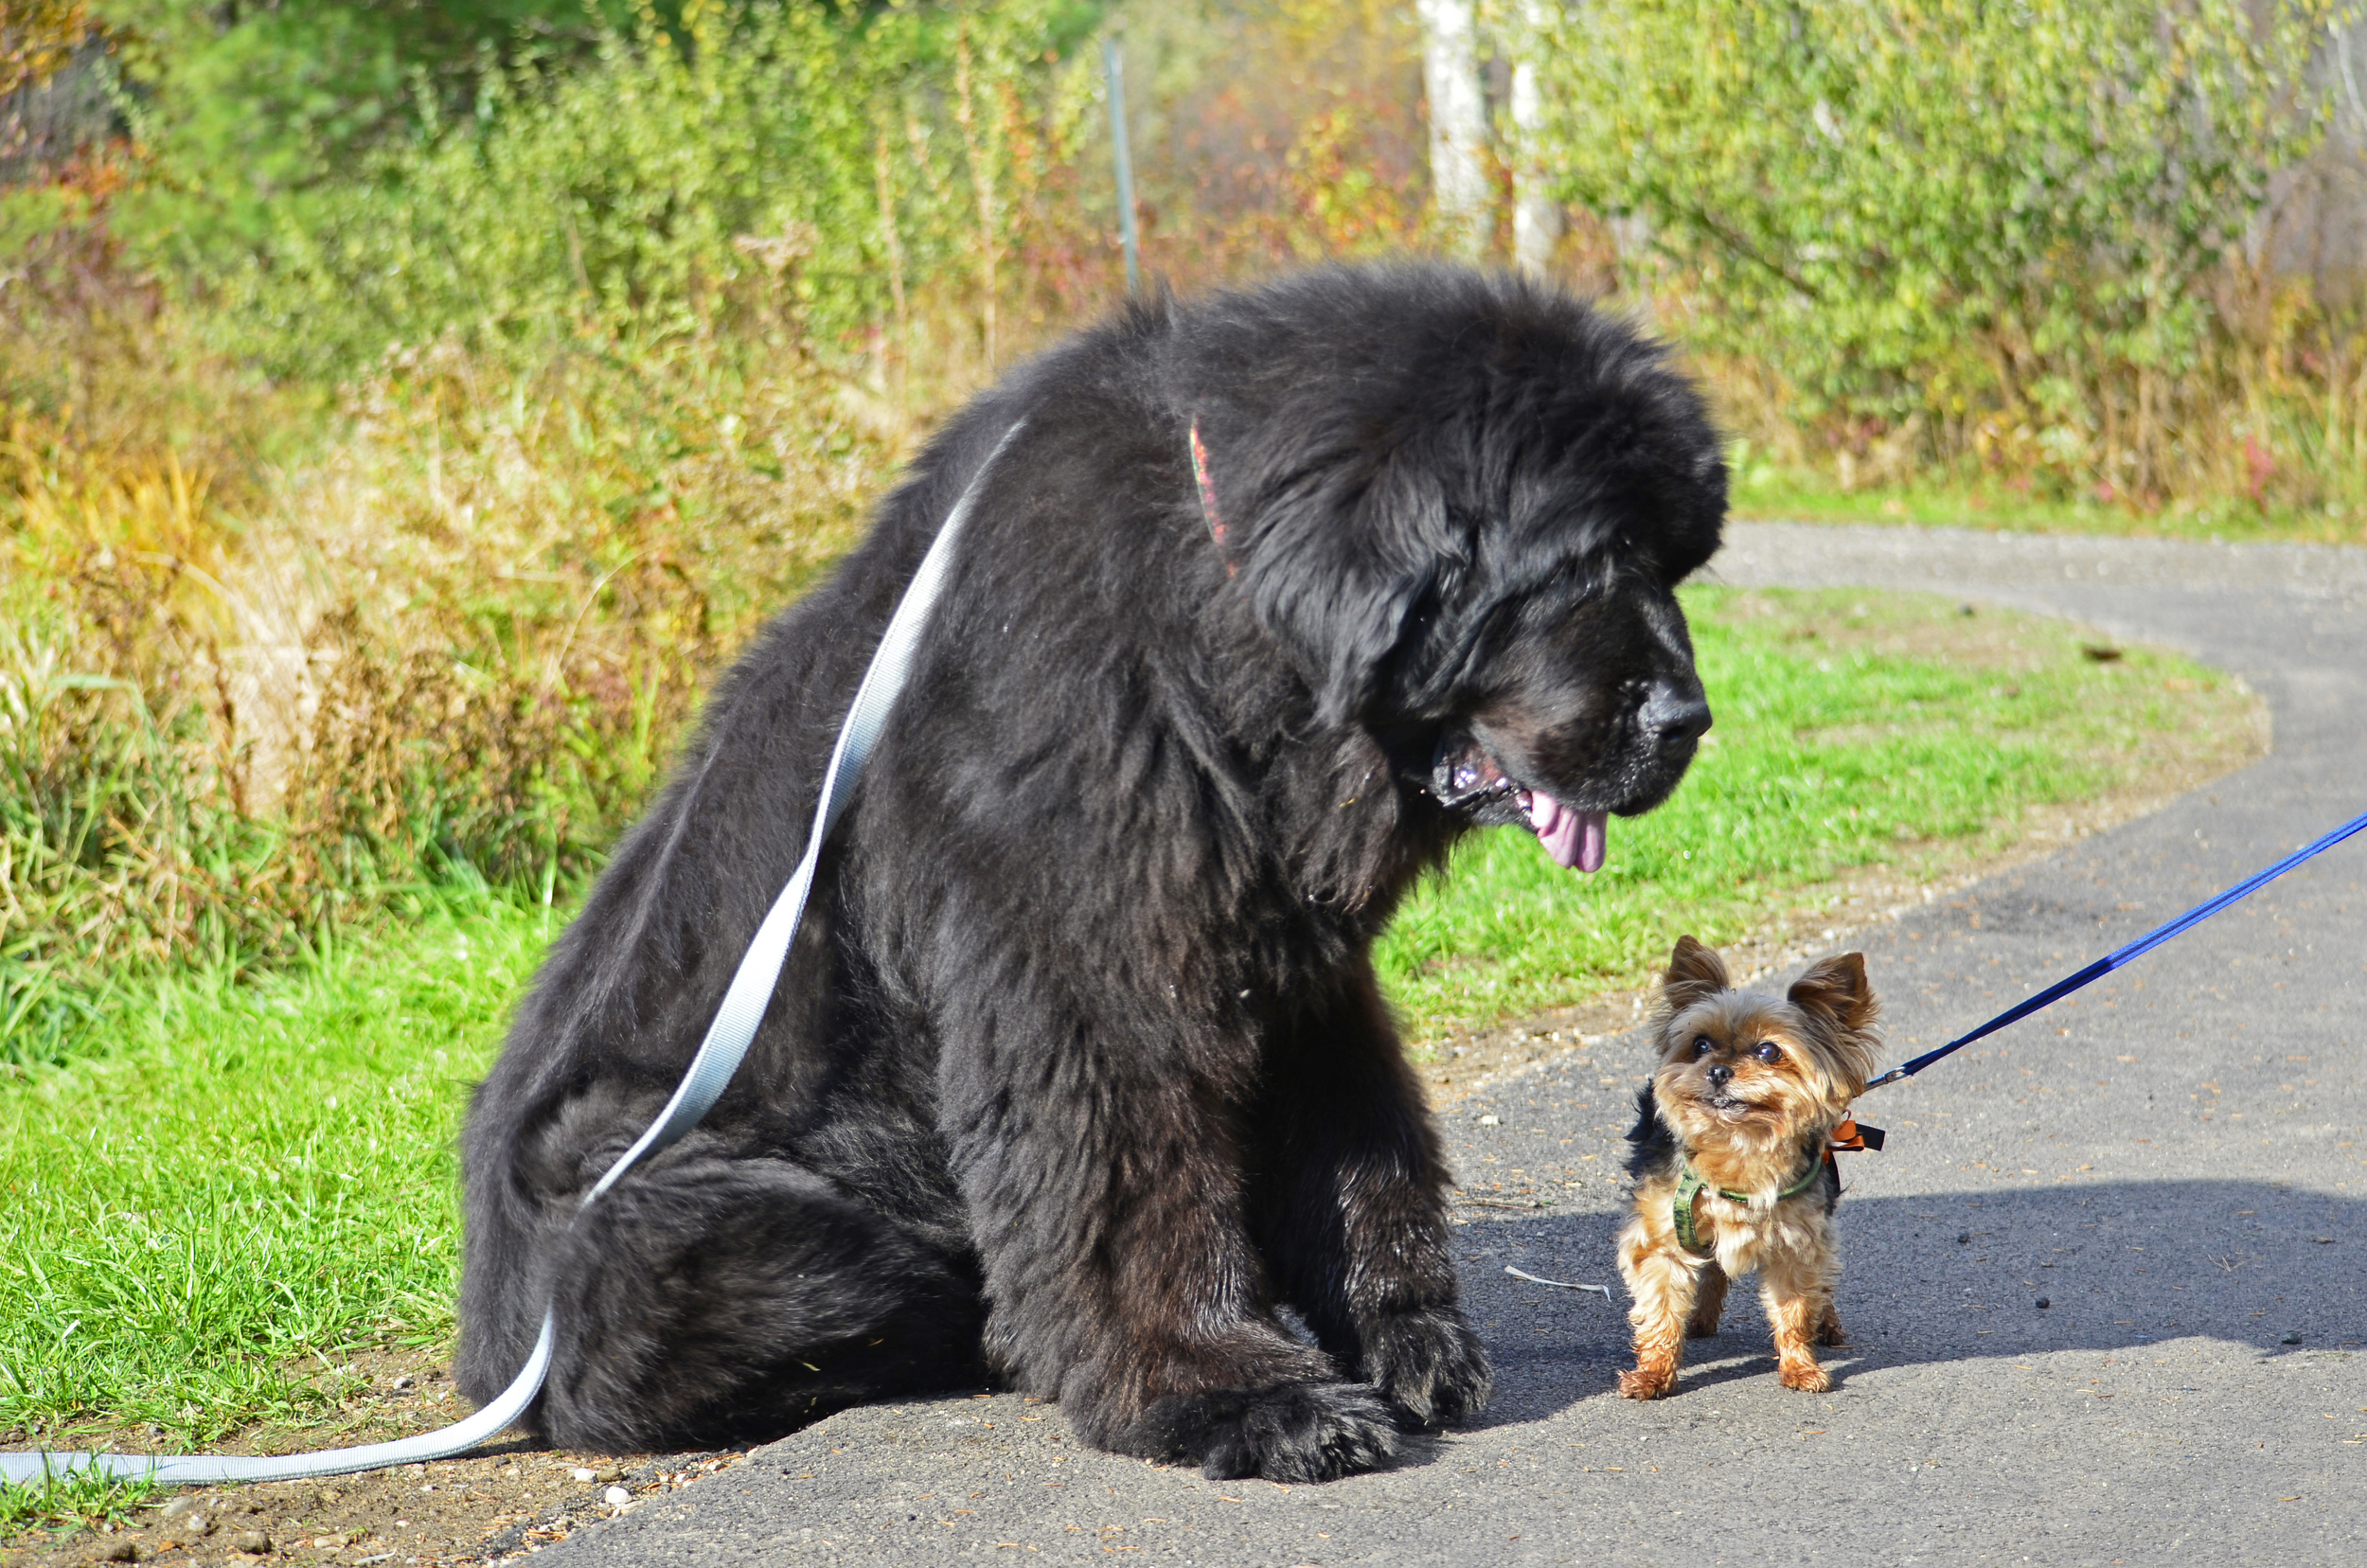 Skyla meets a friend.